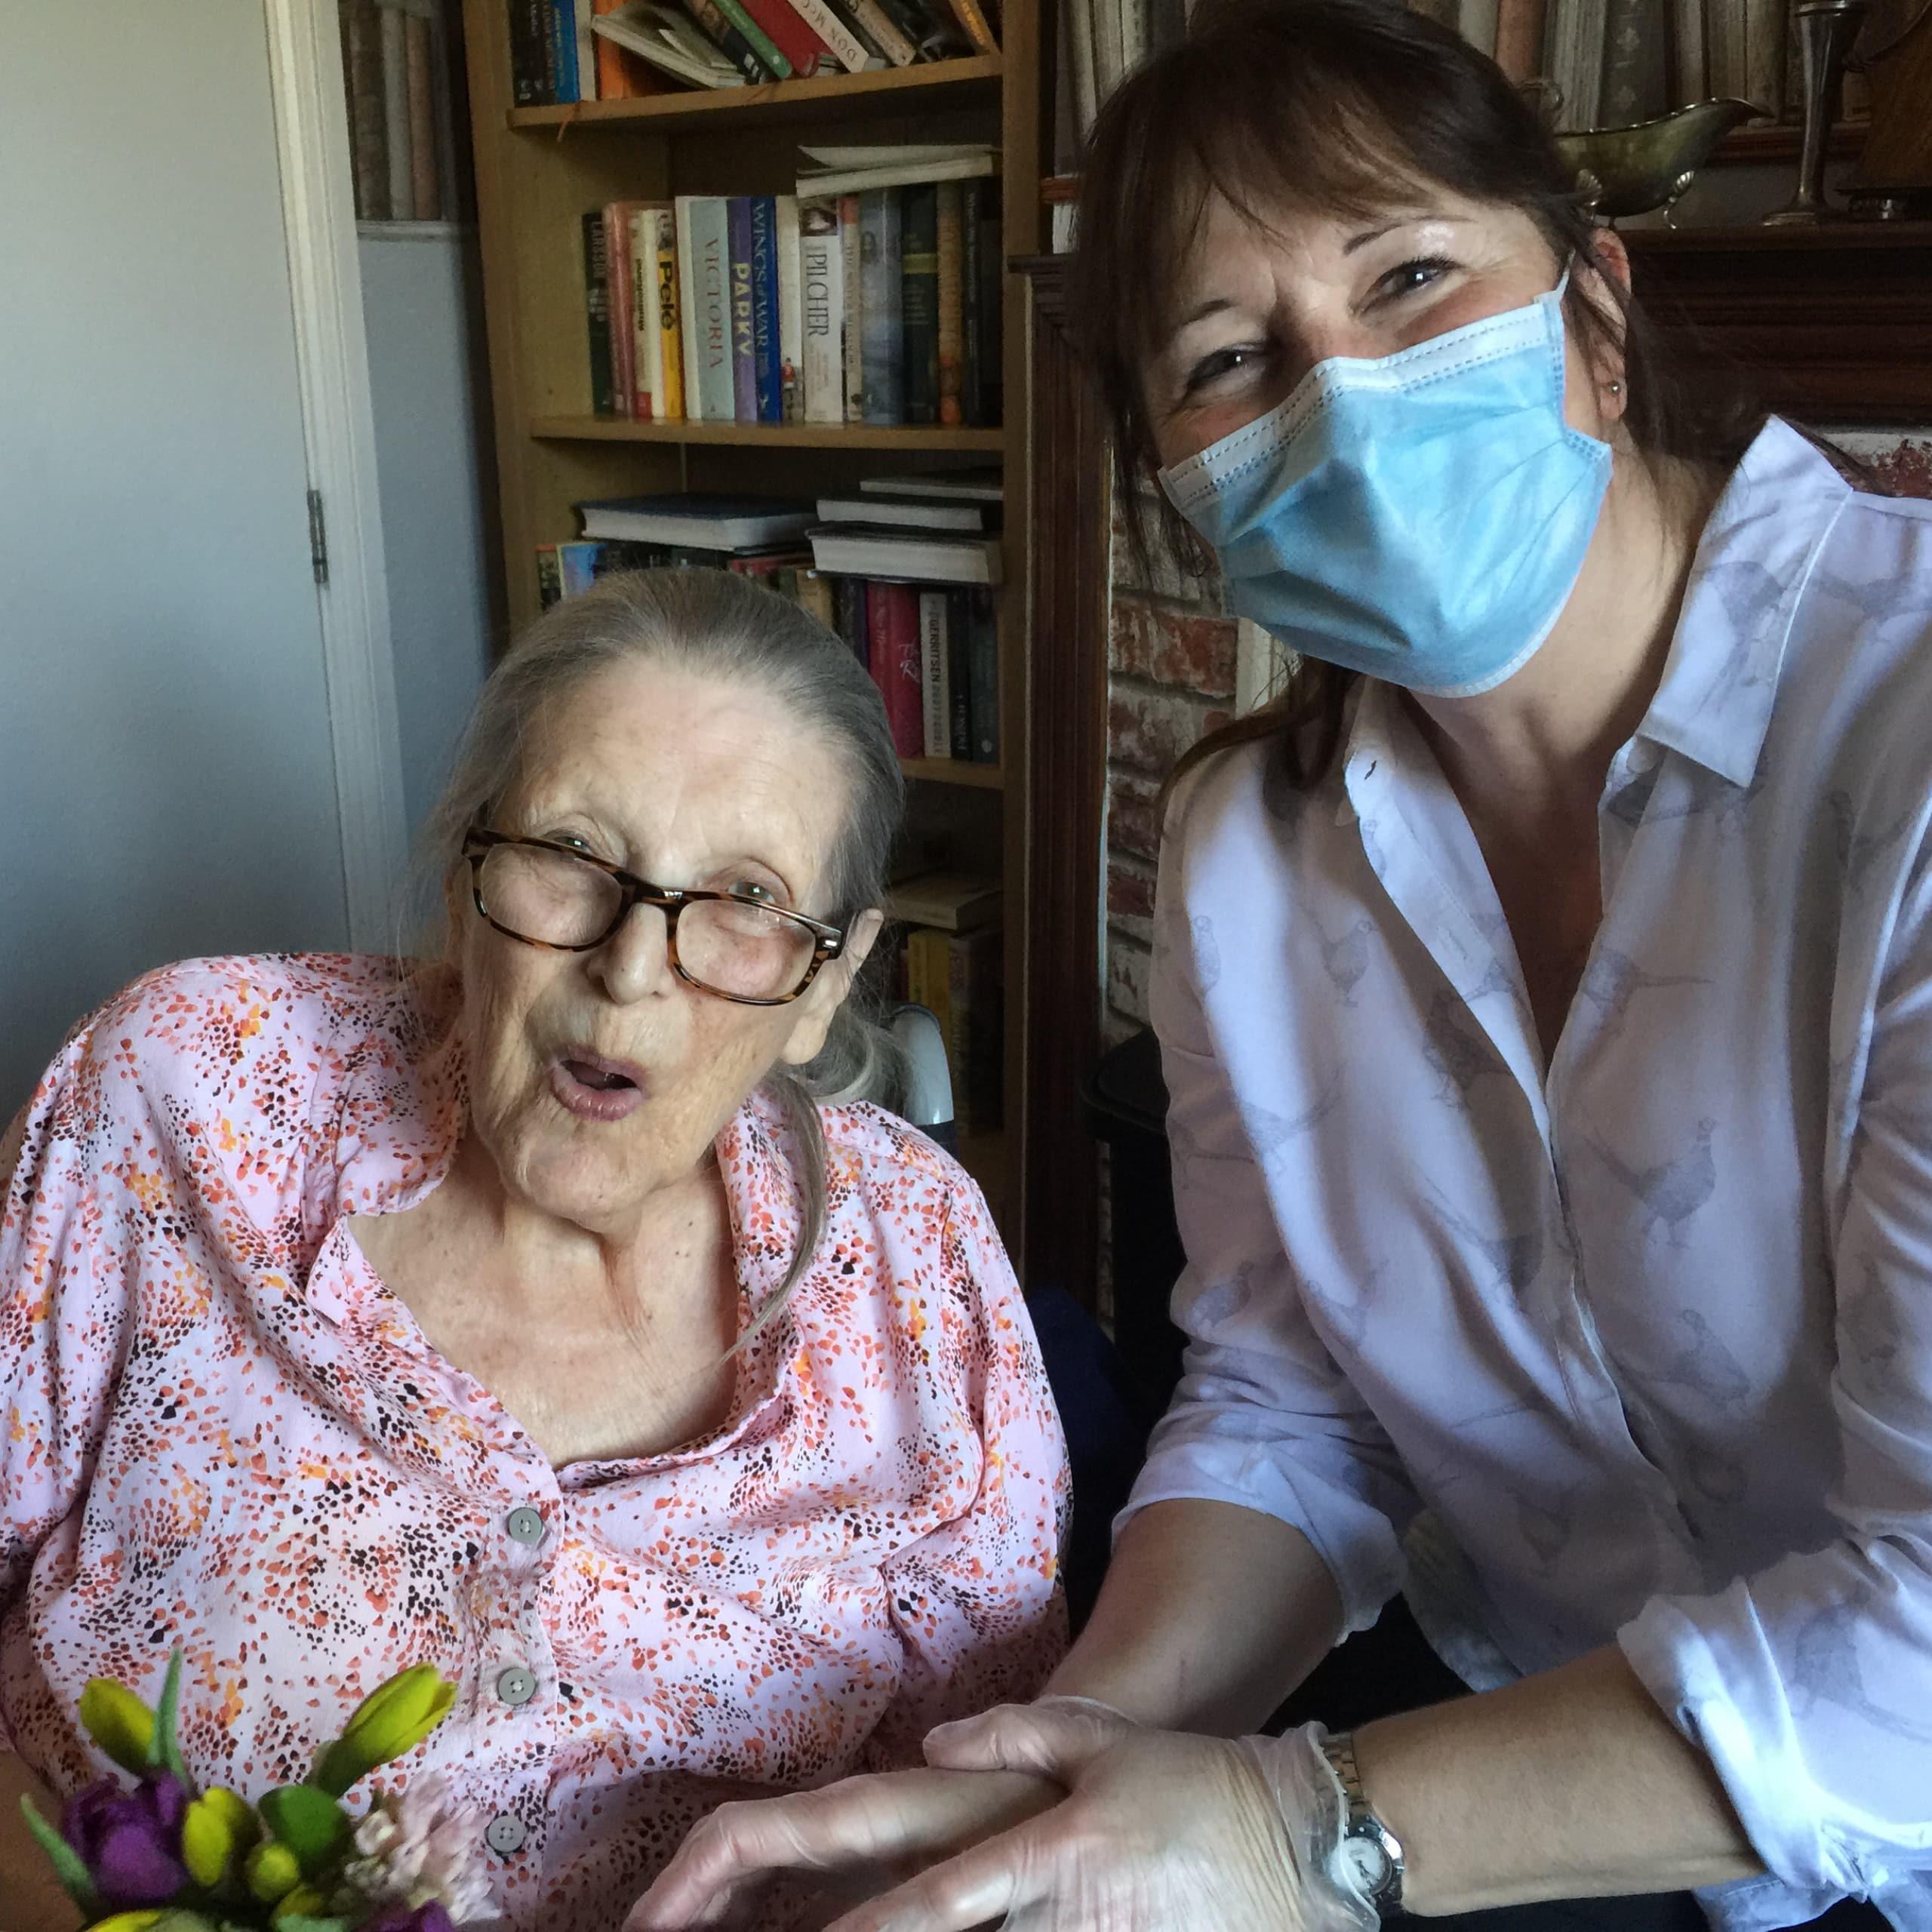 Dungate Manor Care Home resident Pamela Turner enjoying a visit from her daughter Deborah Pearle.